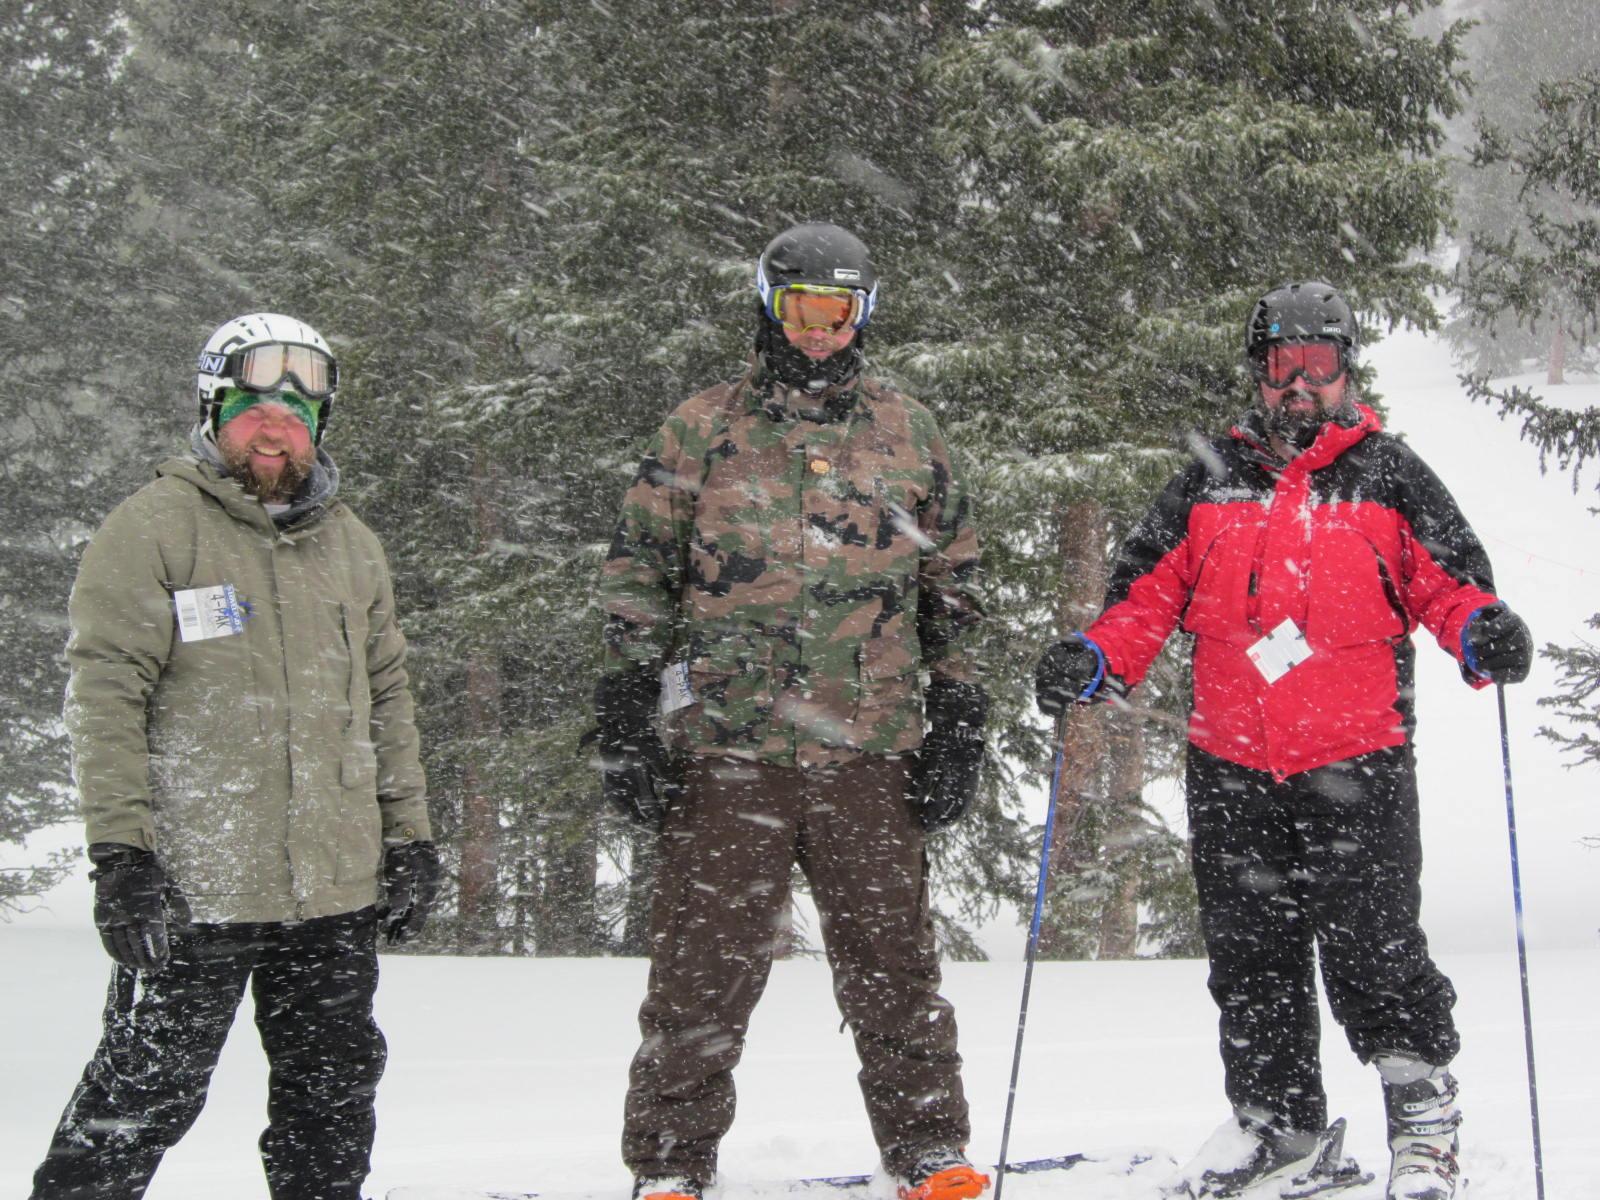 2119 ski